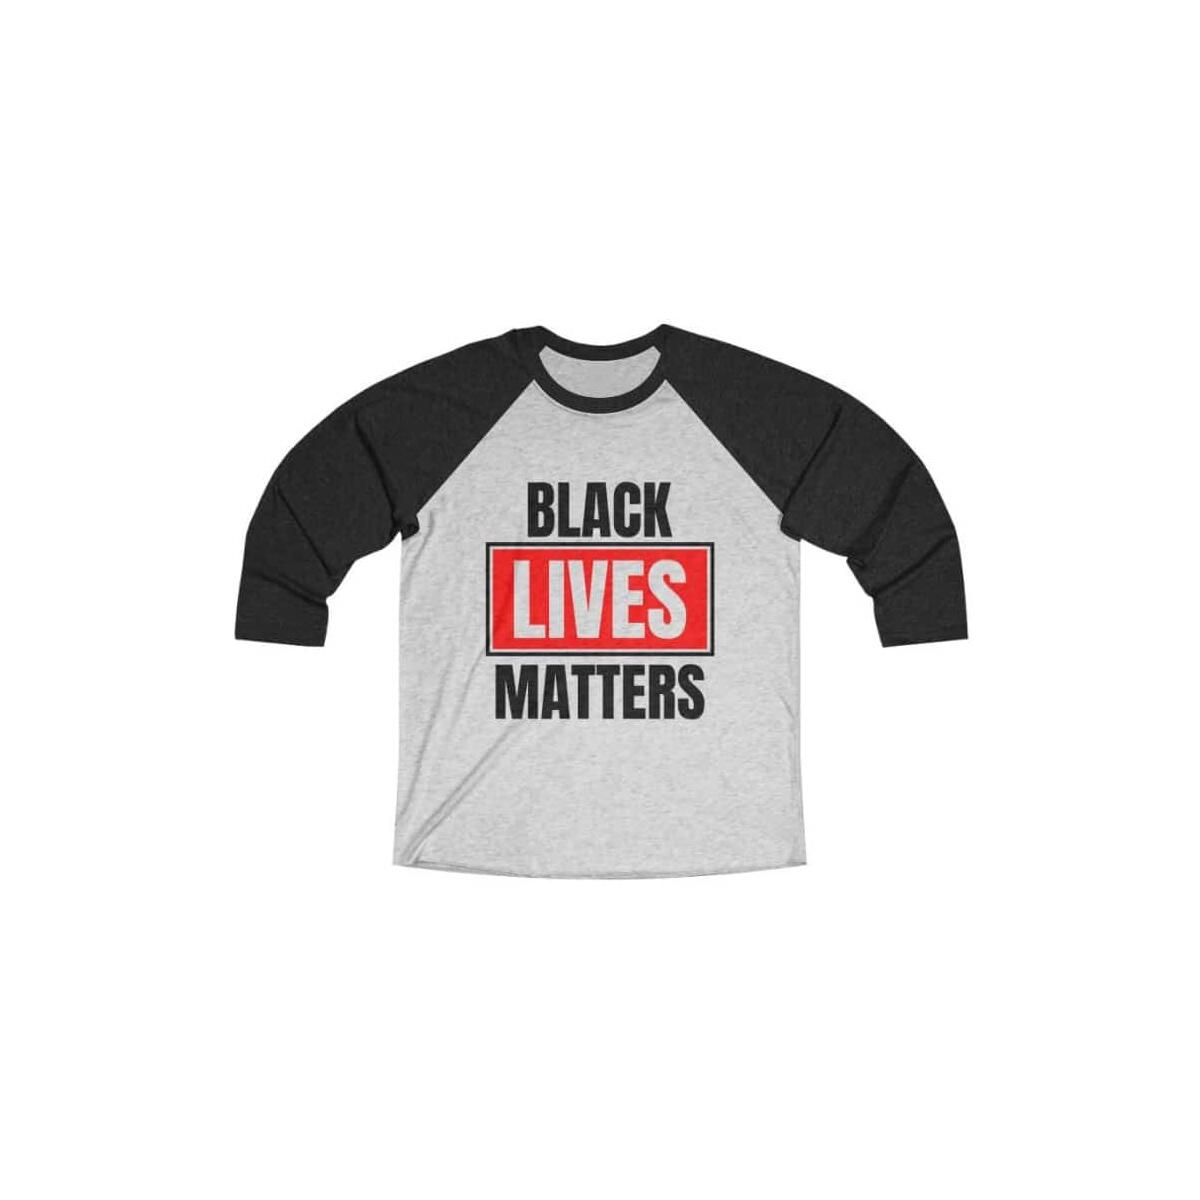 Afrocentric Black Lives Matters Tri-Blend Raglan Tee, Vintage Black / Heather White / XL